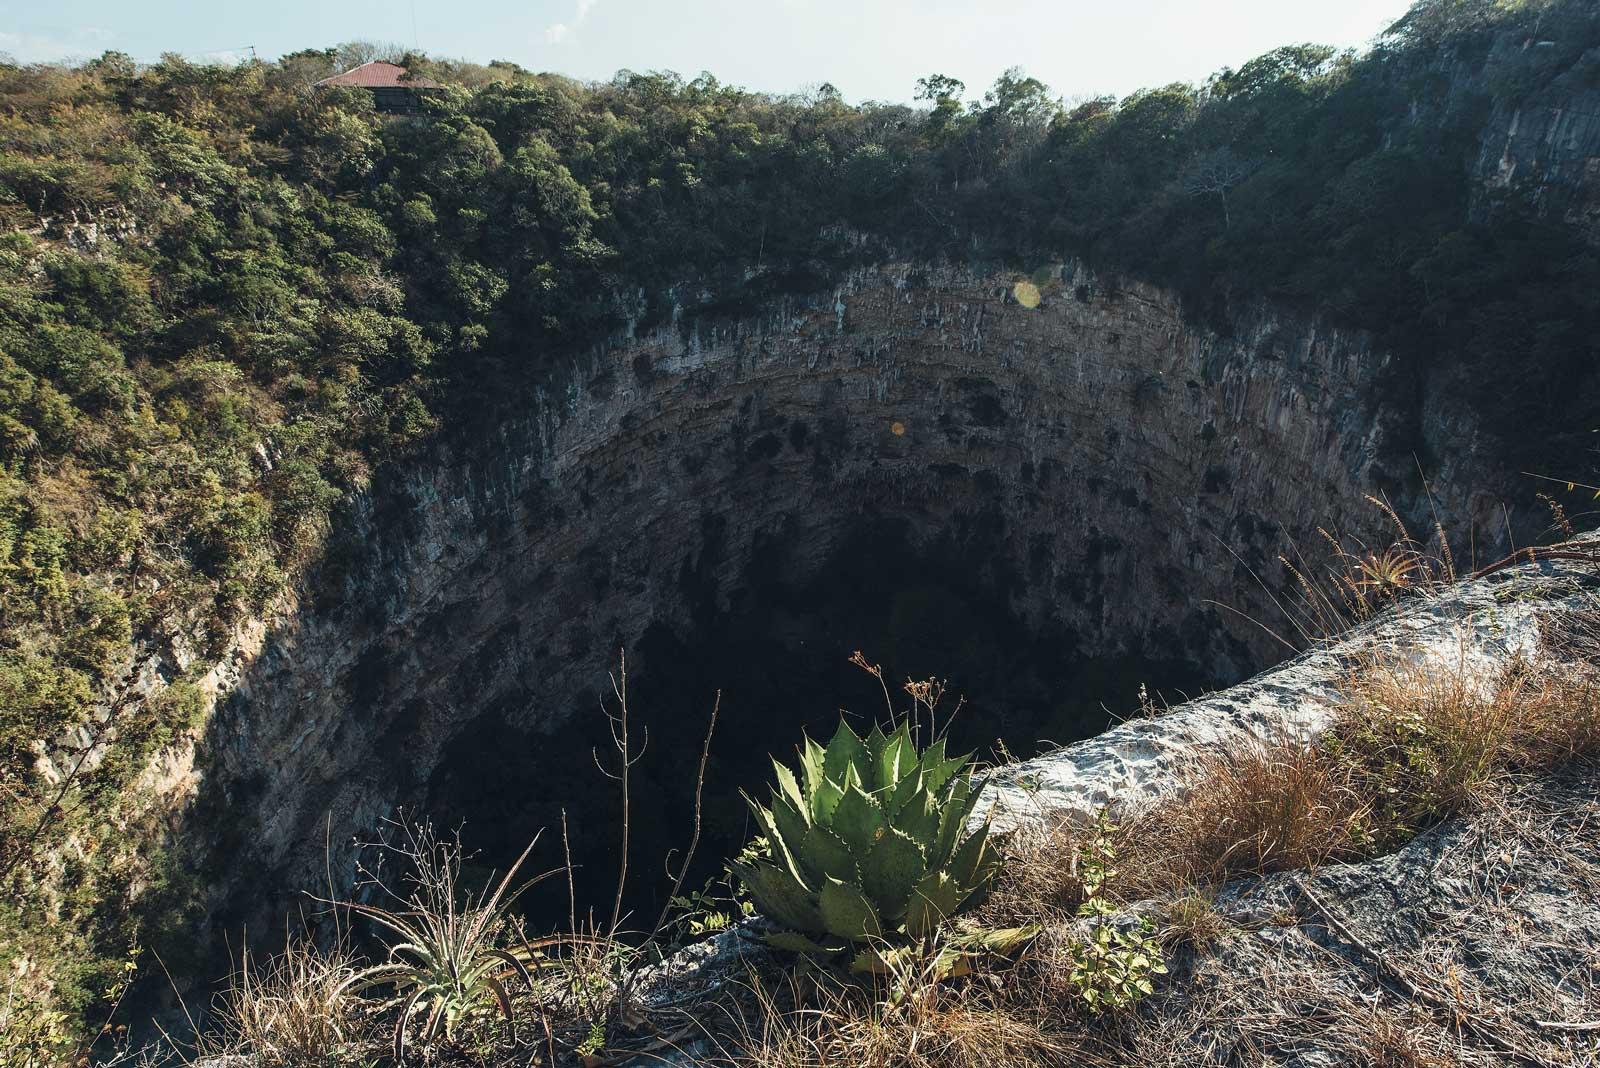 Trou dans la Terre: Sima de las Cotorras, Chiapas